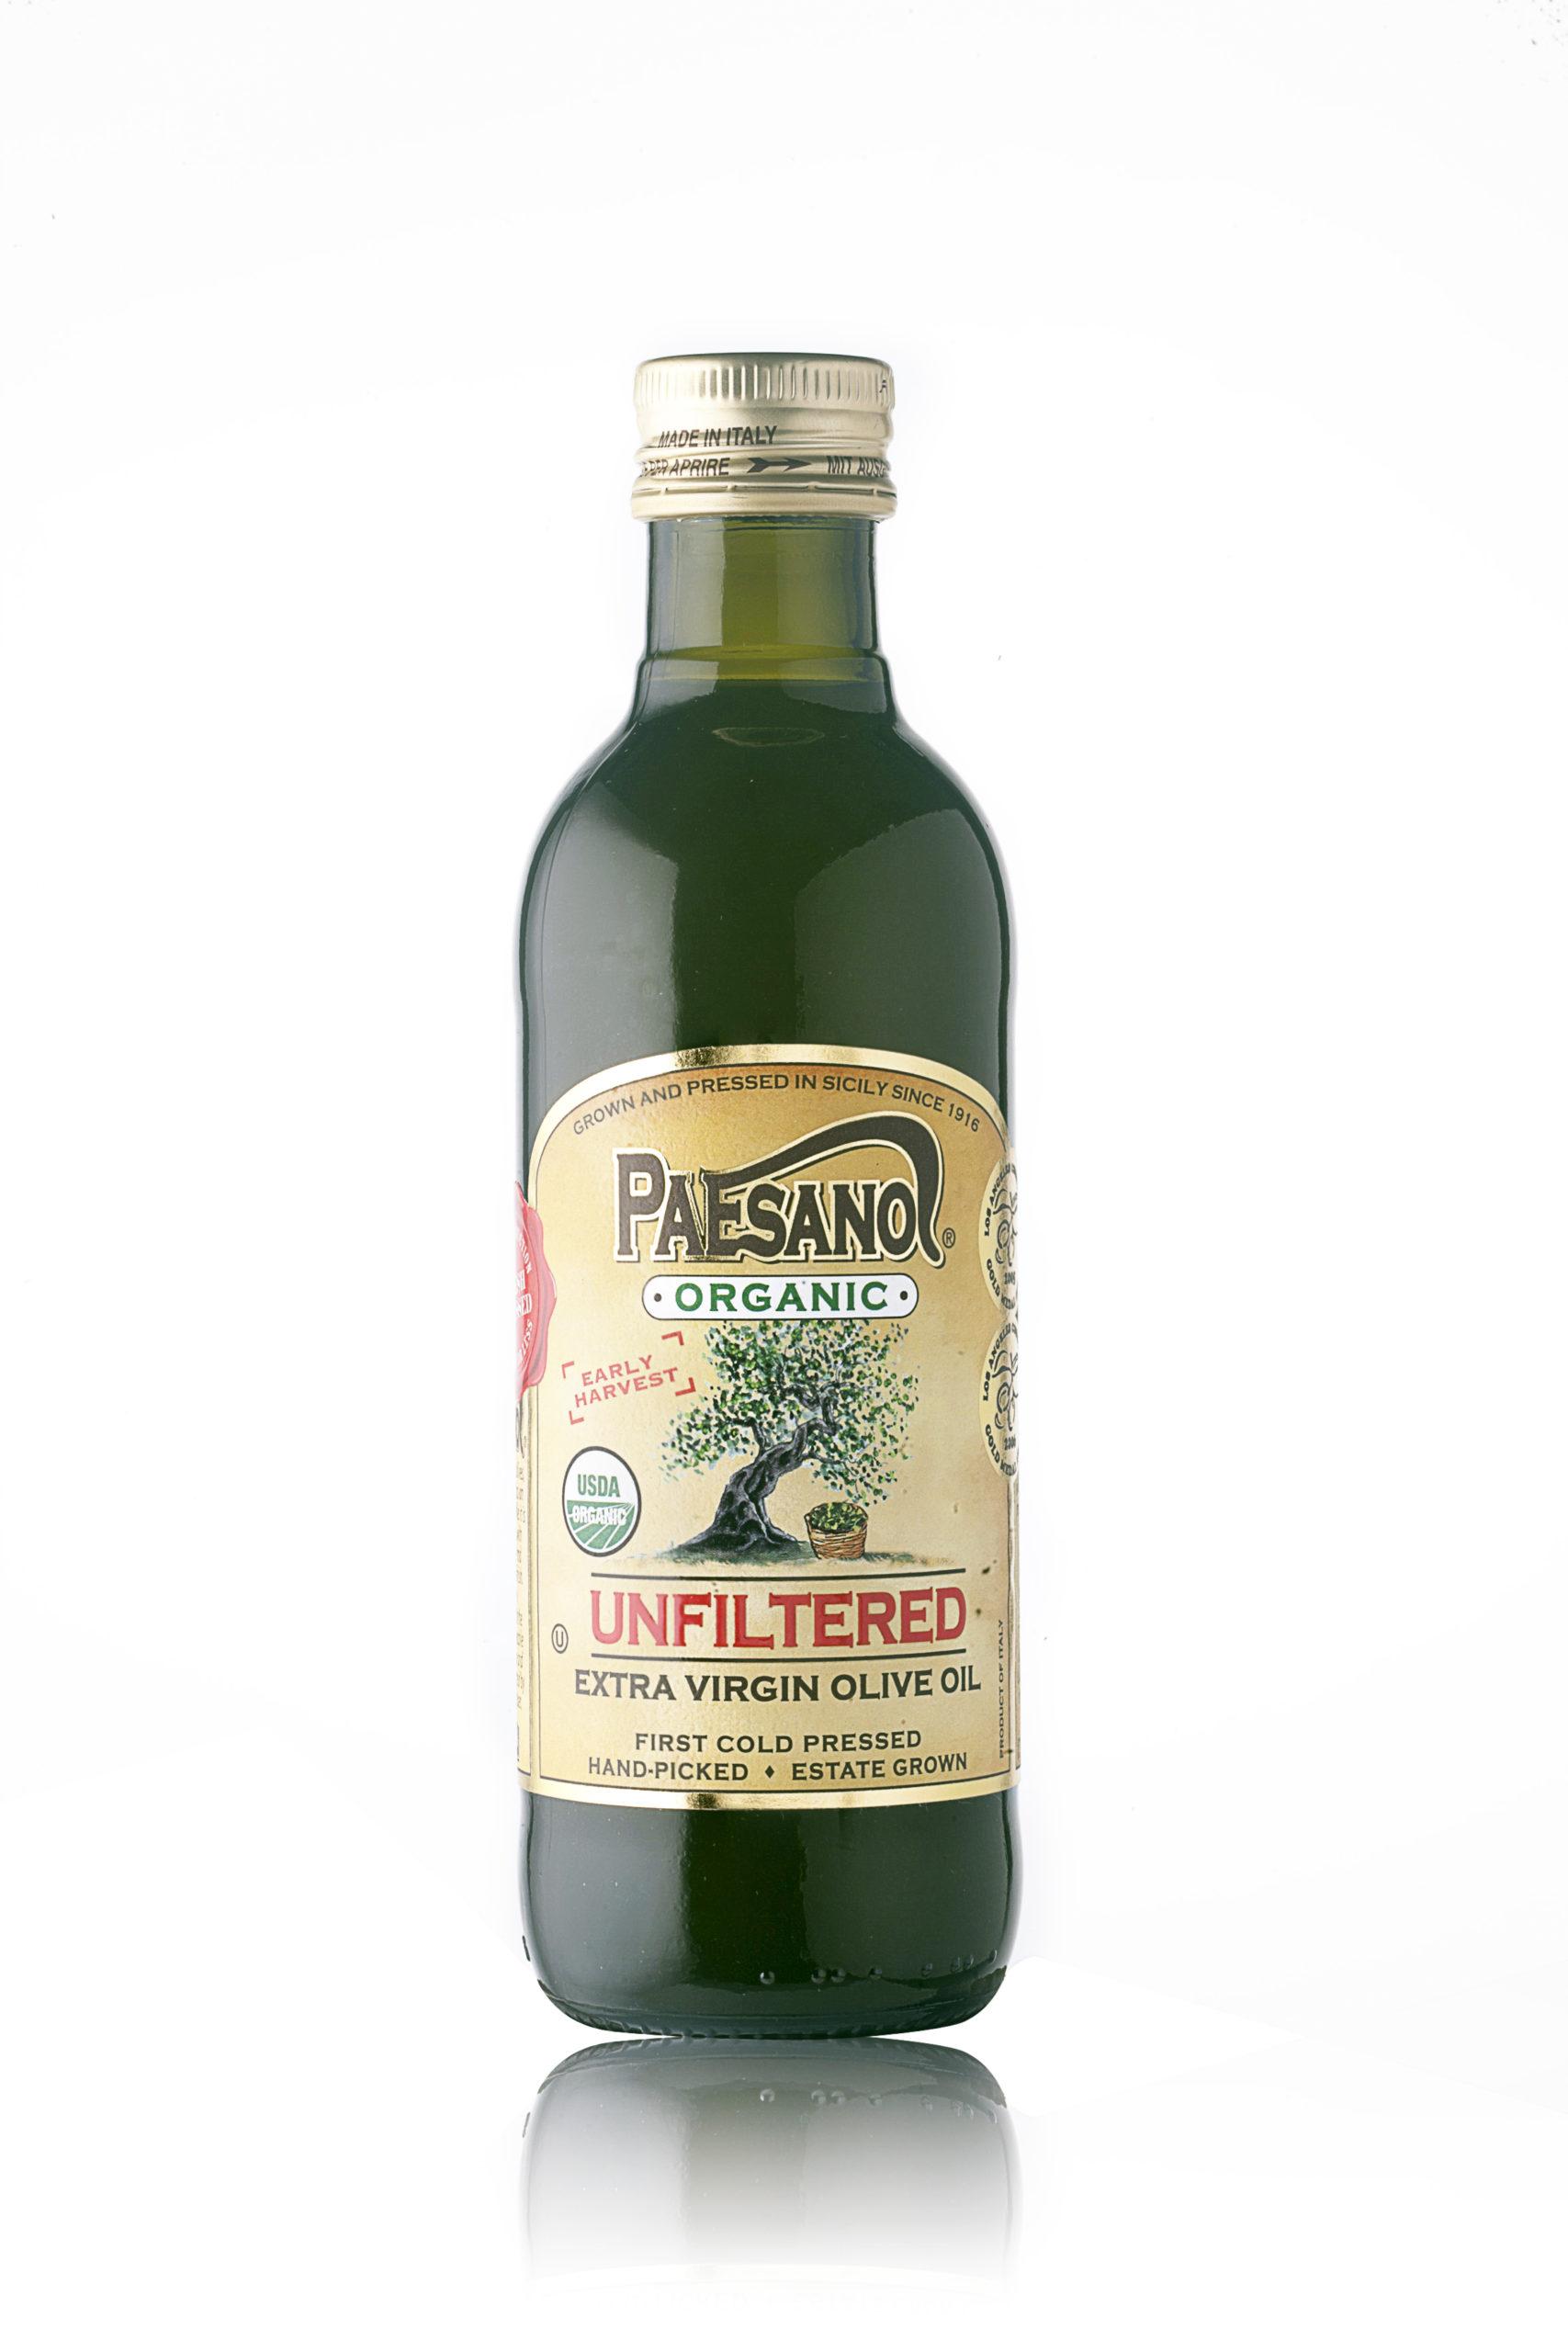 Paesanol USDA ORGANIC UNFILTERED Extra Virgin Olive Oil